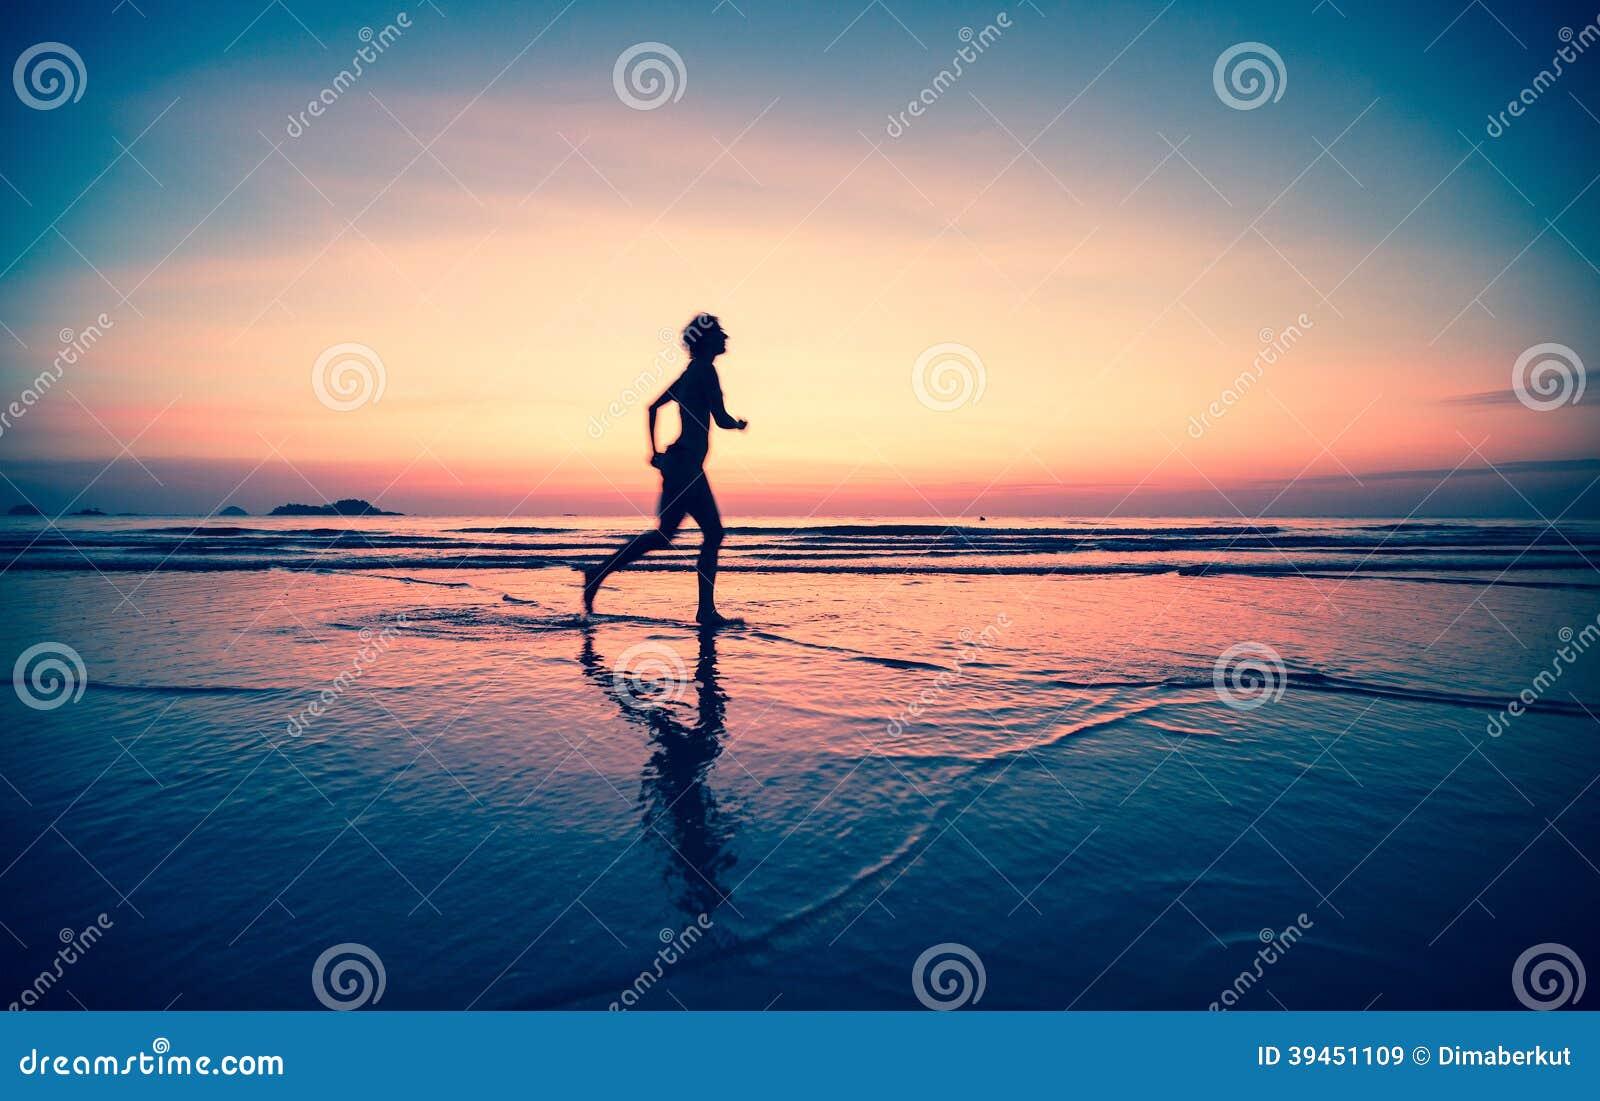 Blured kontur av en kvinnajogger på stranden på solnedgången